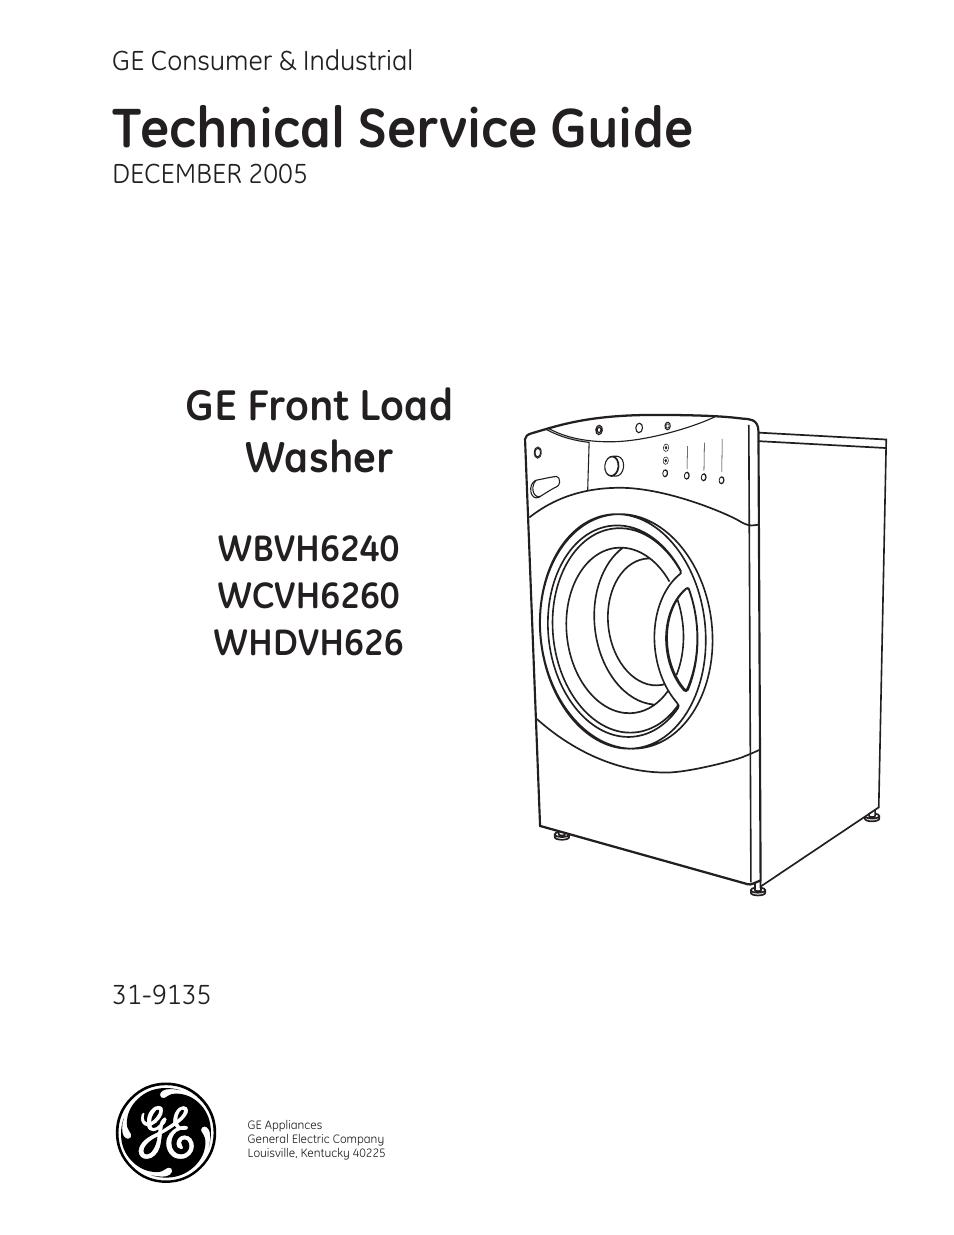 ge wbvh6240 user manual 61 pages rh manualsdir com ge technical service guide for active damper ge technical service guide top load washer